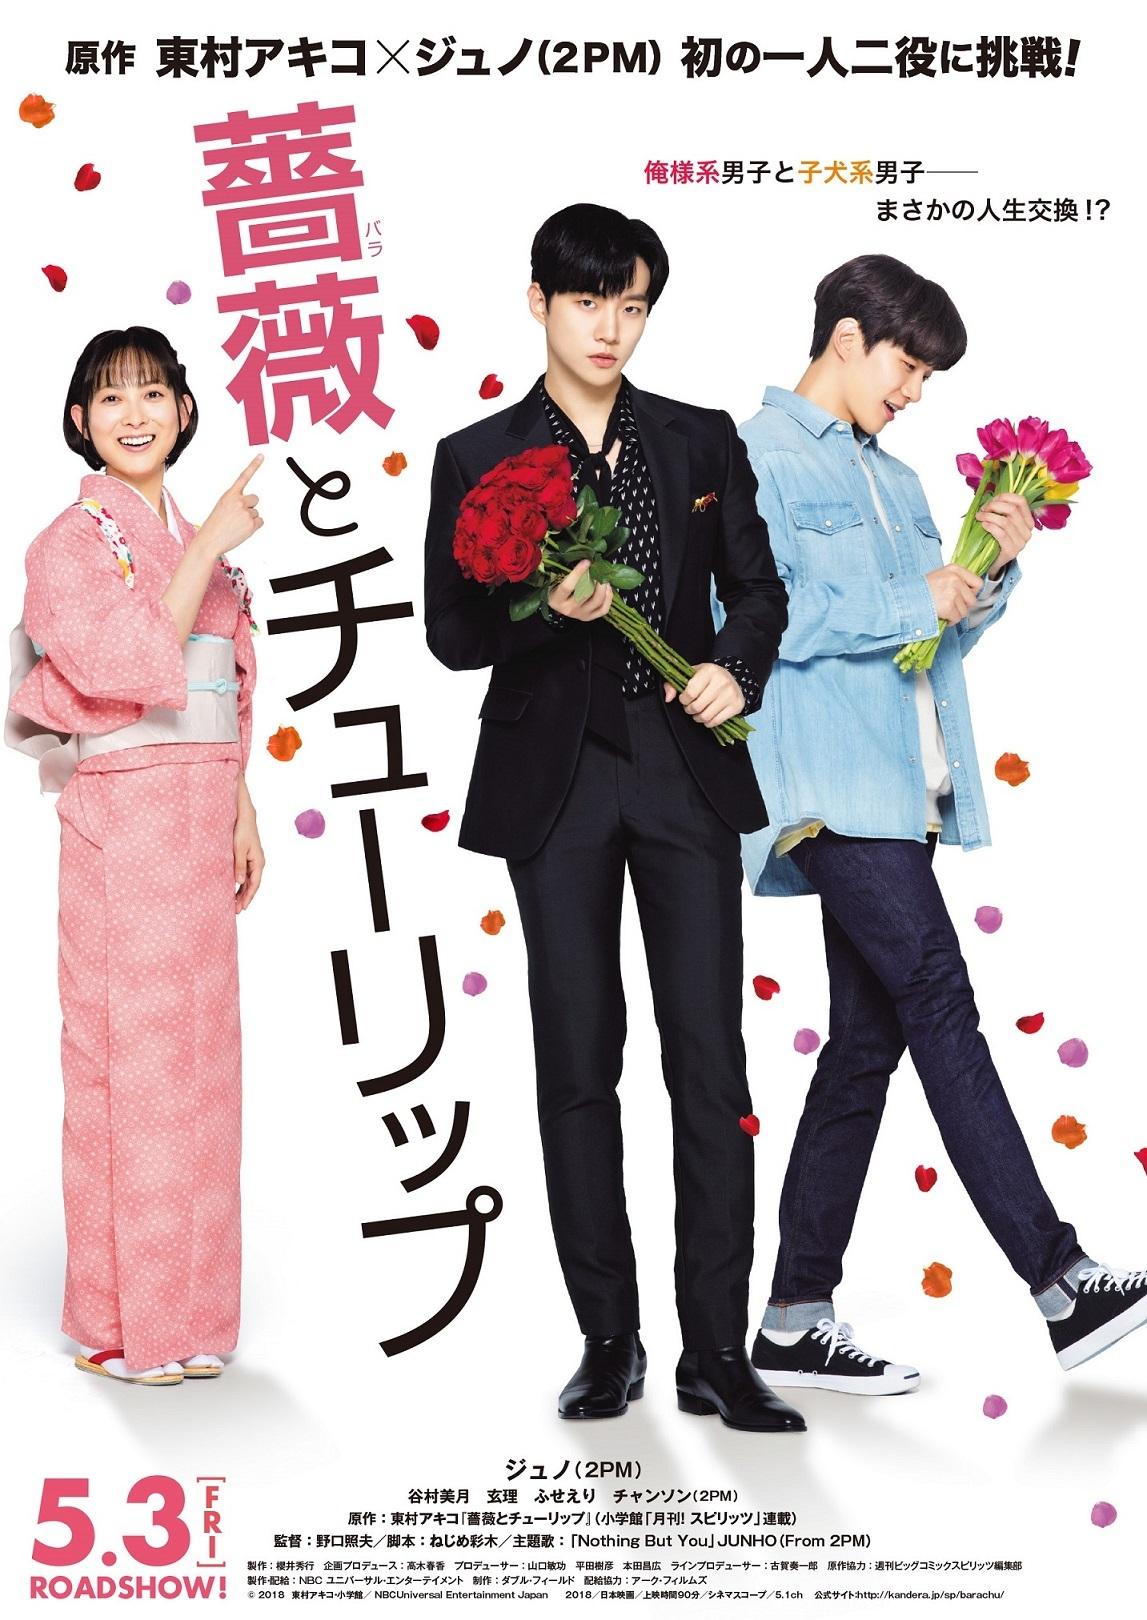 (C)2018 東村アキコ・小学館/ NBCUniversal Entertainment Japan